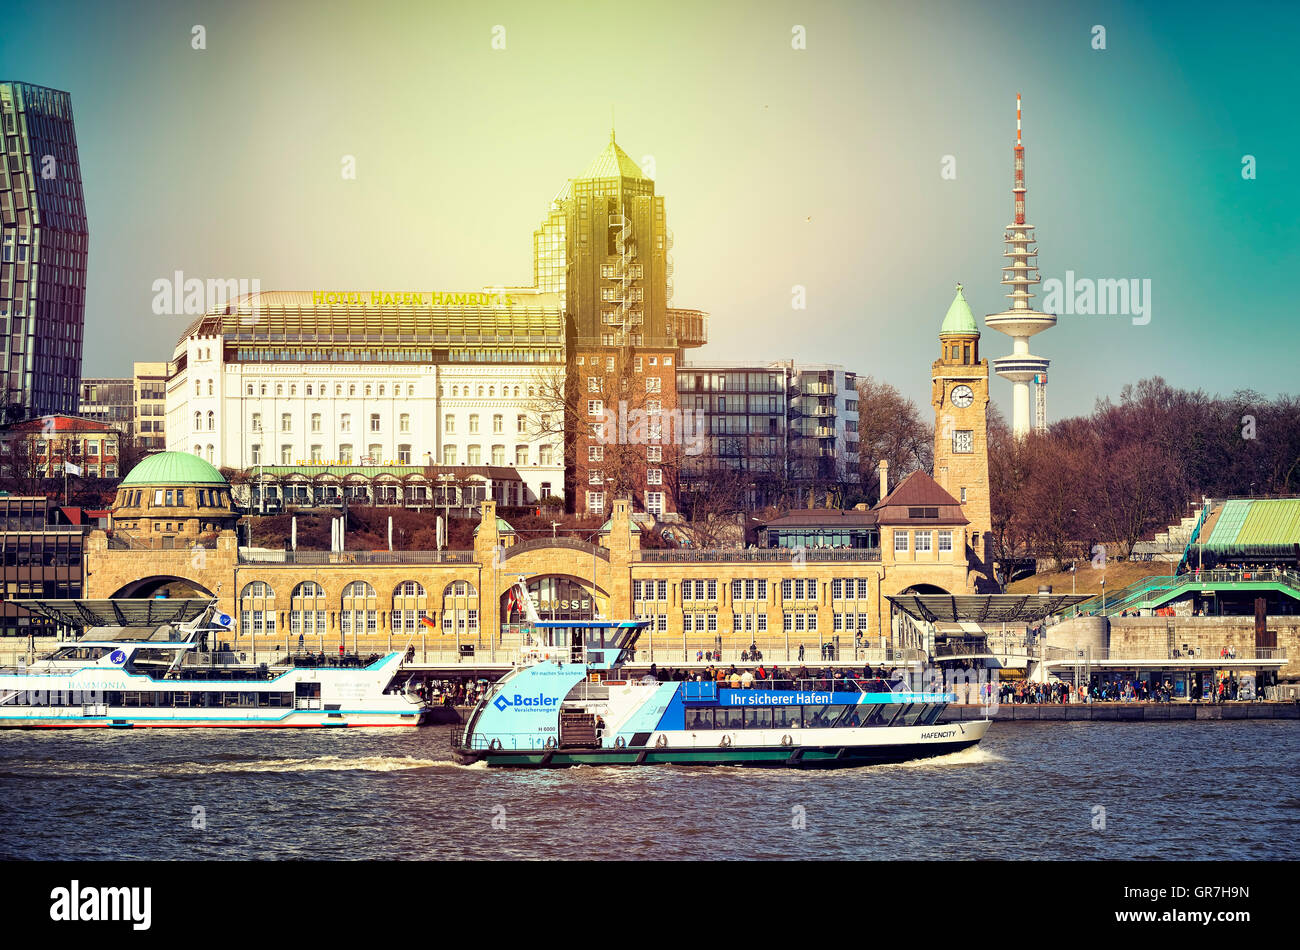 St. Pauli Piers In Hamburg, Germany - Stock Image